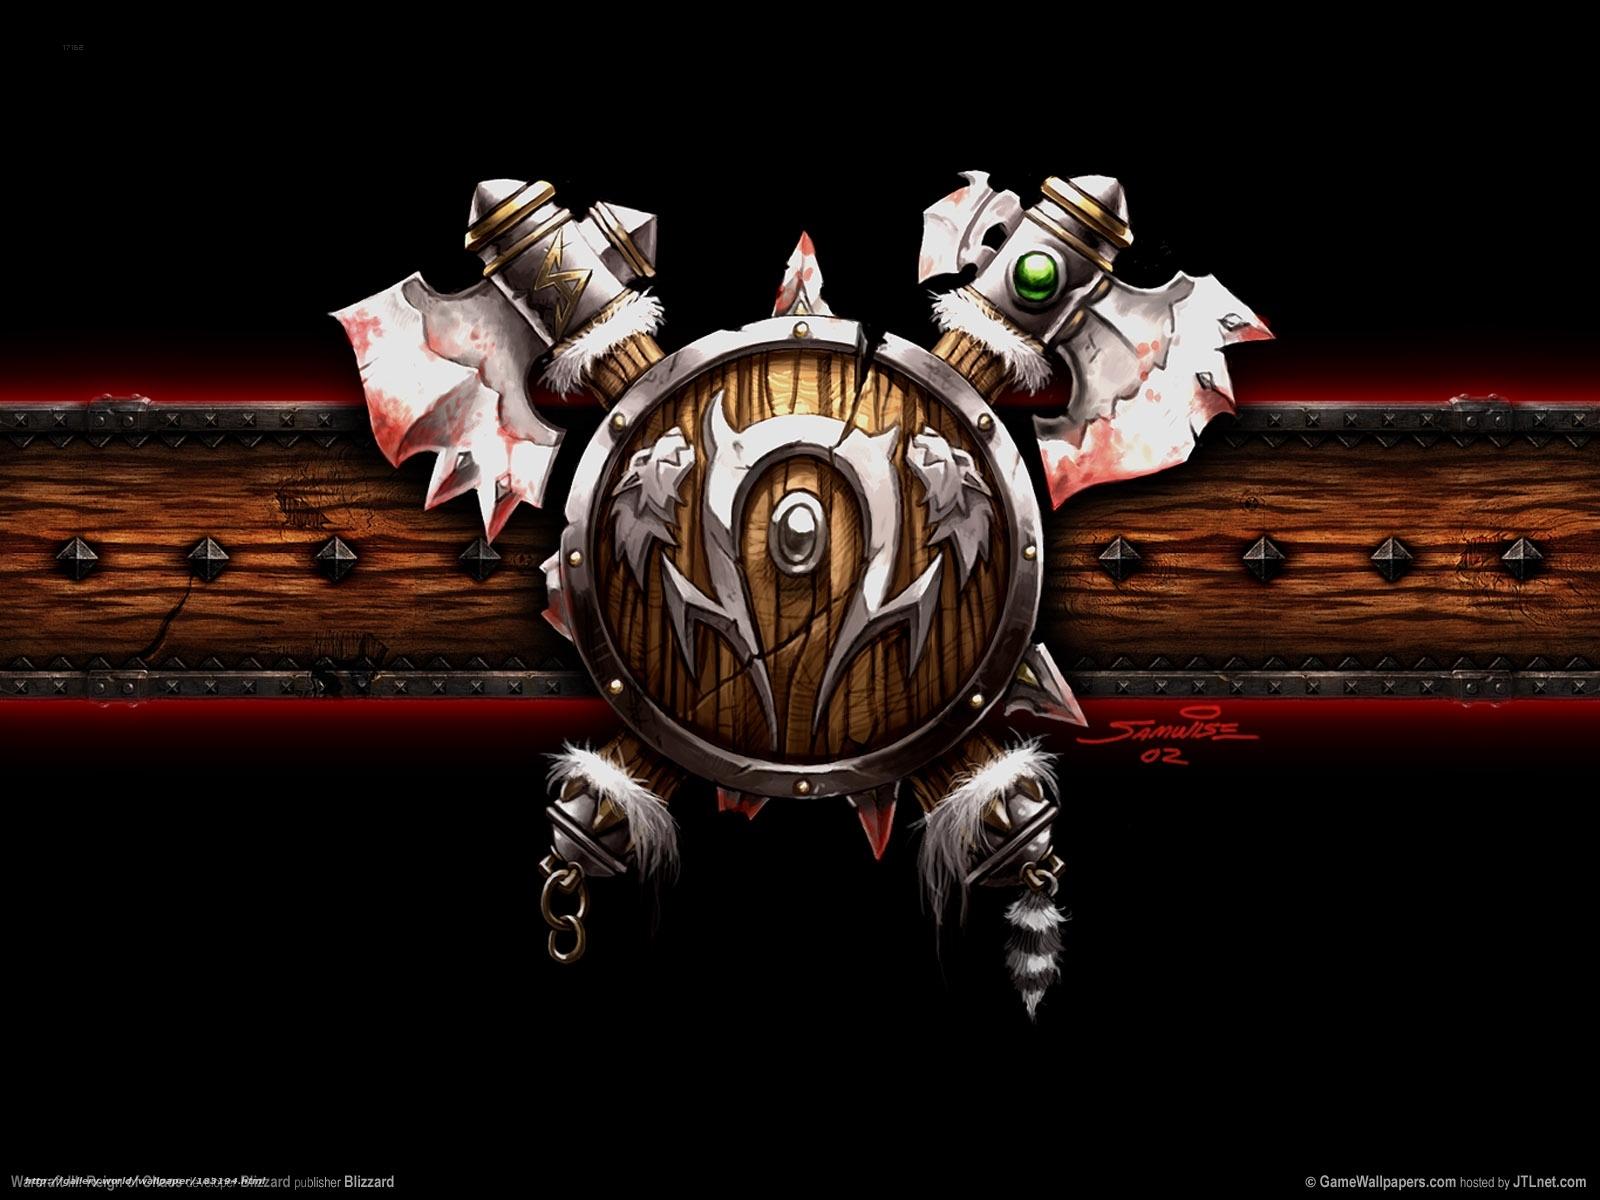 Warcraft 3 expansion 1v1 orc strat sex movies